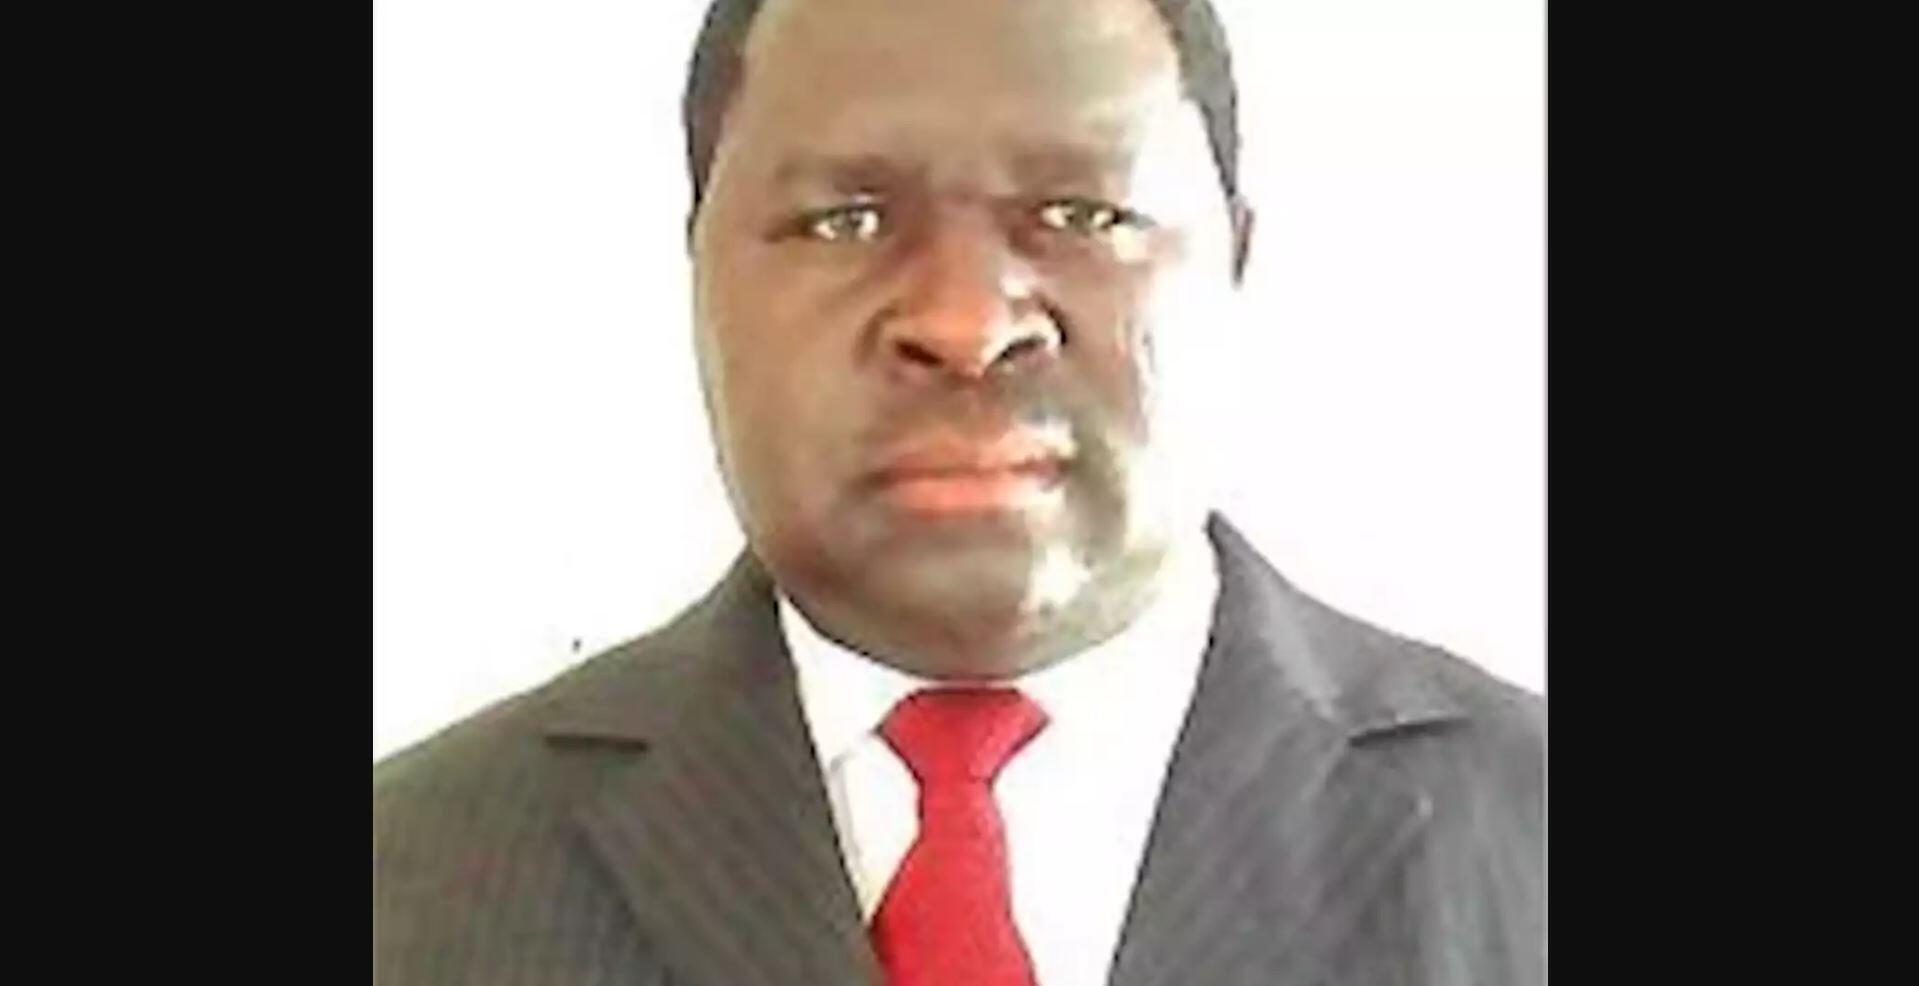 2020-12-04 namibia elections adolf hitler uunona Ompundja germany nazi